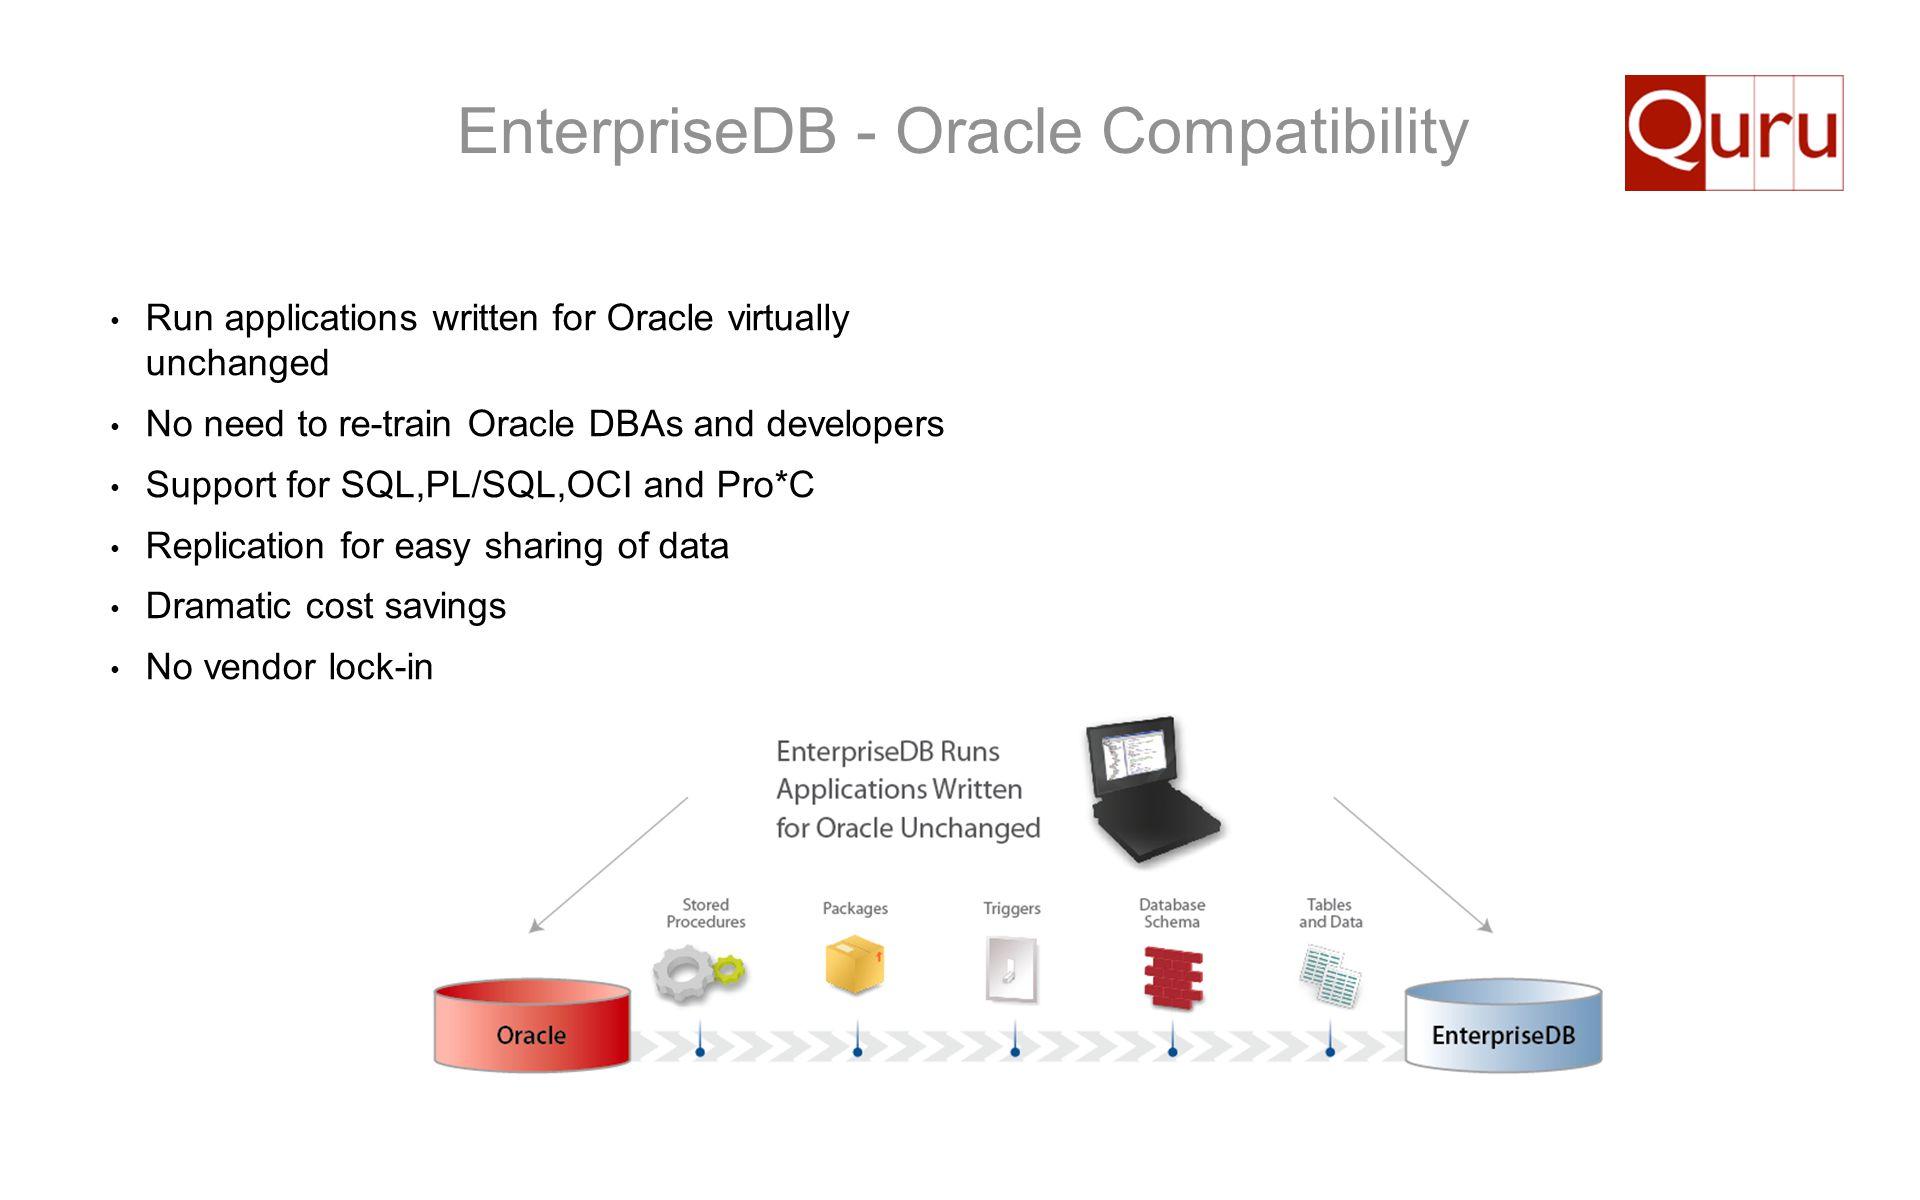 EnterpriseDB - Oracle Compatibility